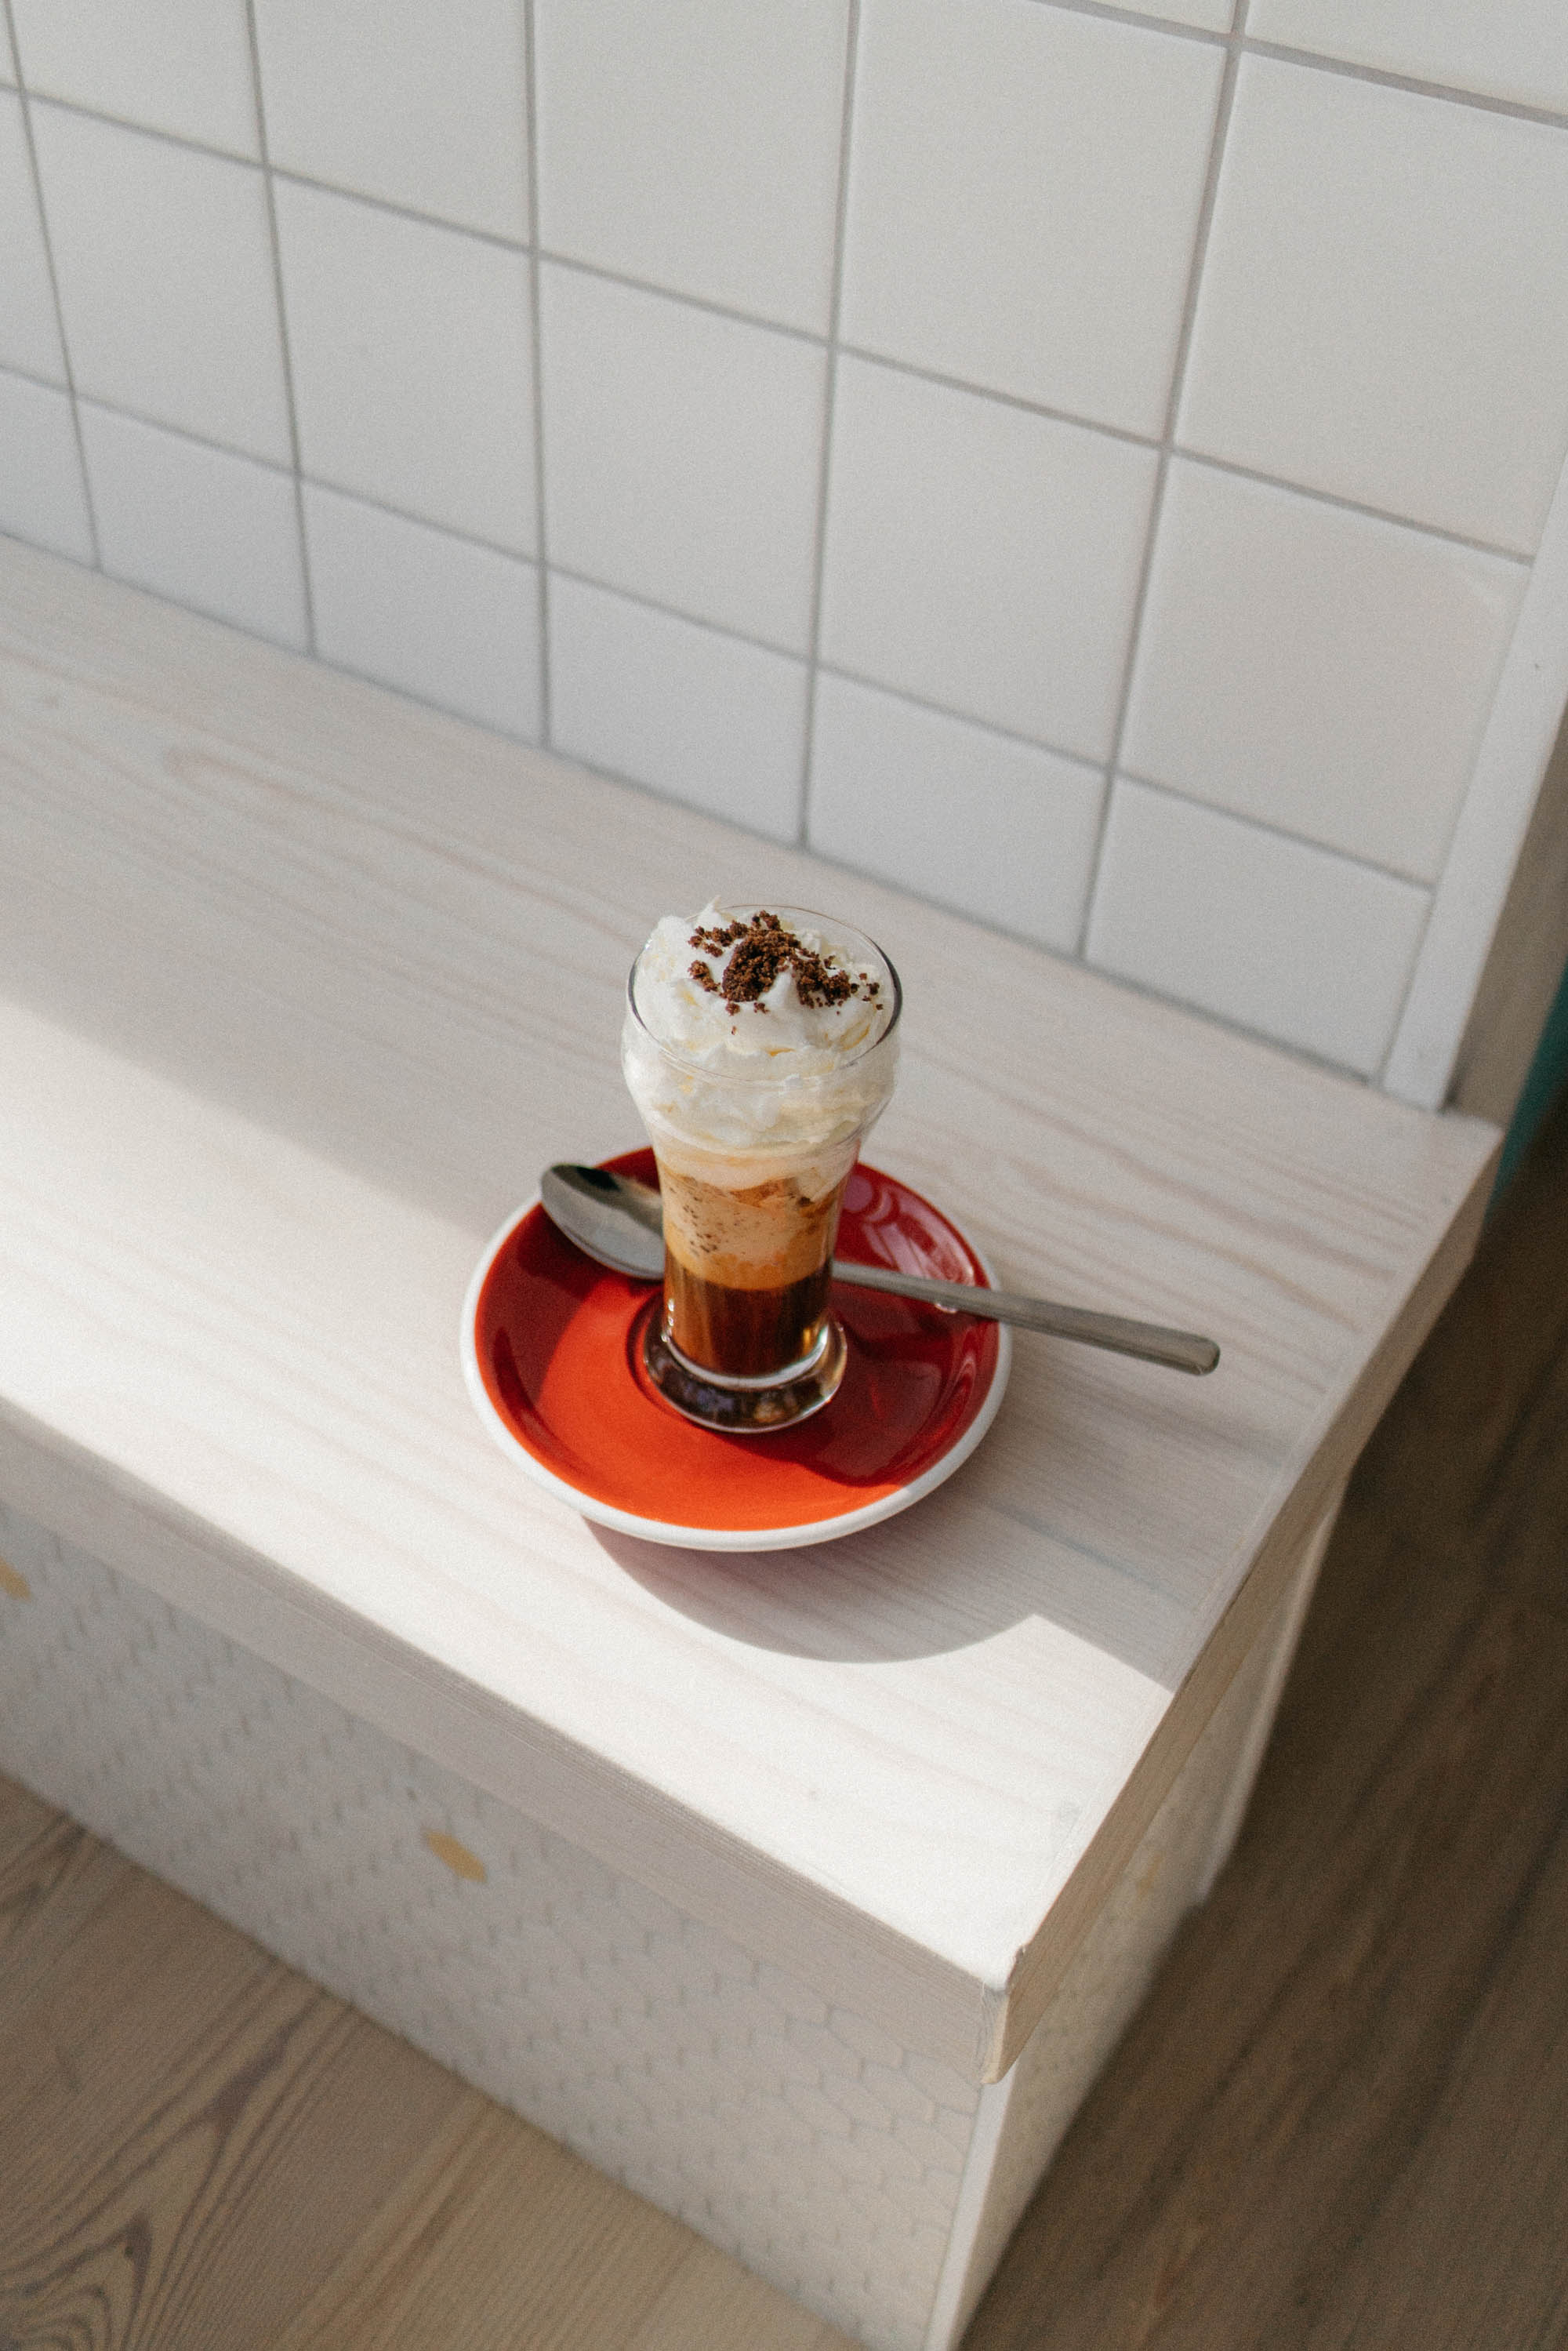 Coffee & Cream by Oddfellows